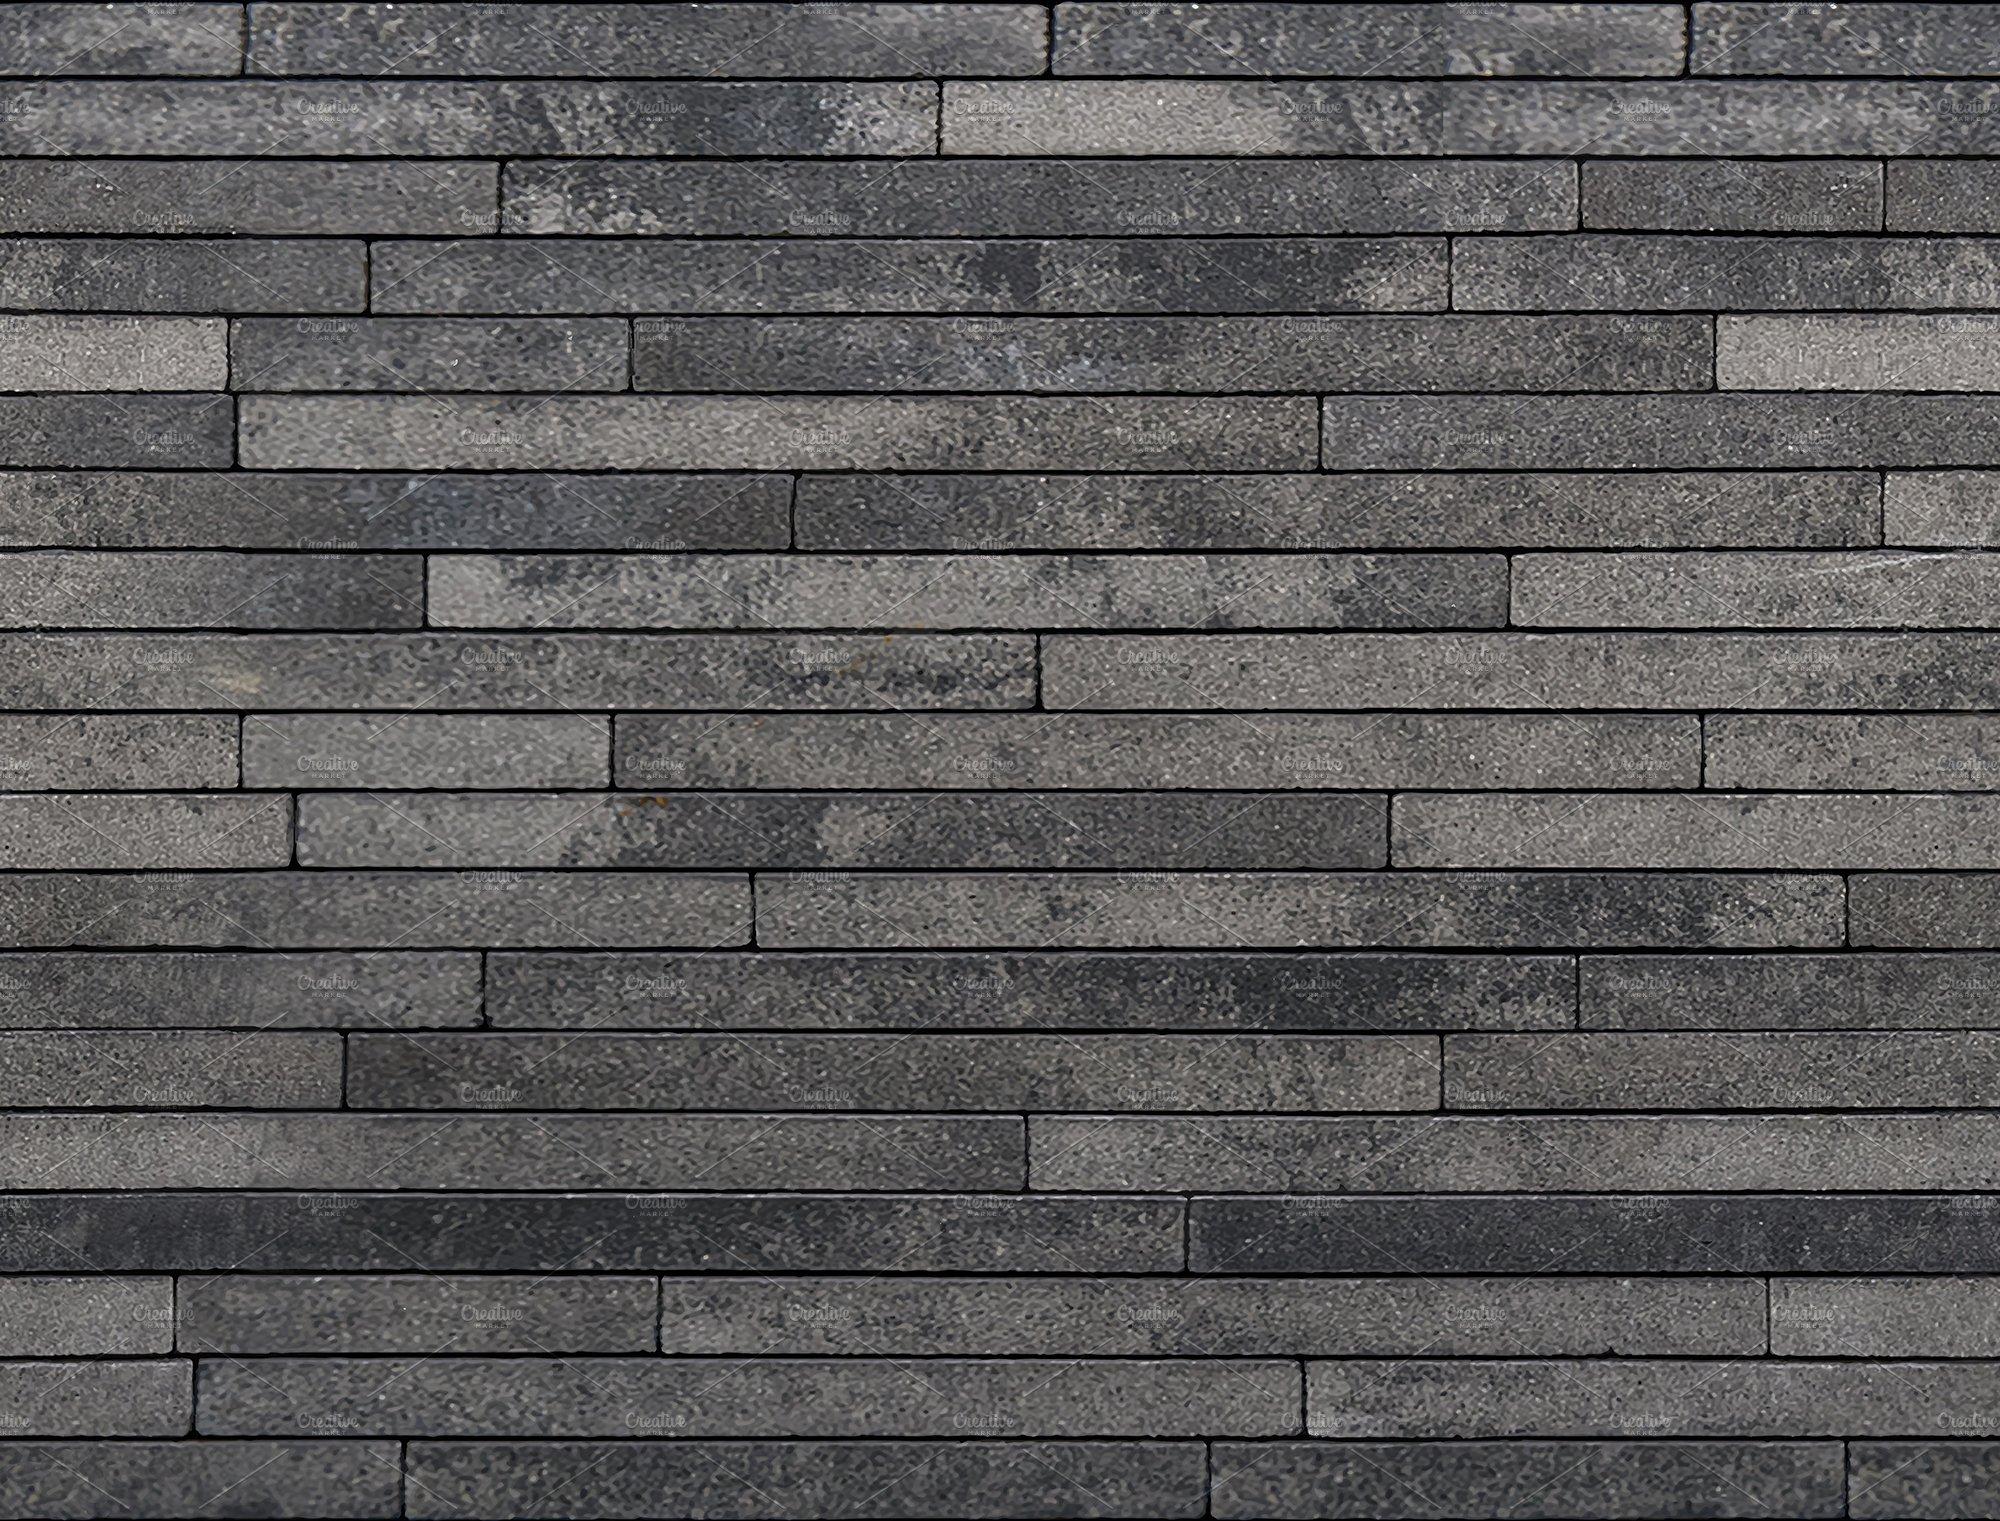 Strip Stone Wall Cladding Texture Textures Creative